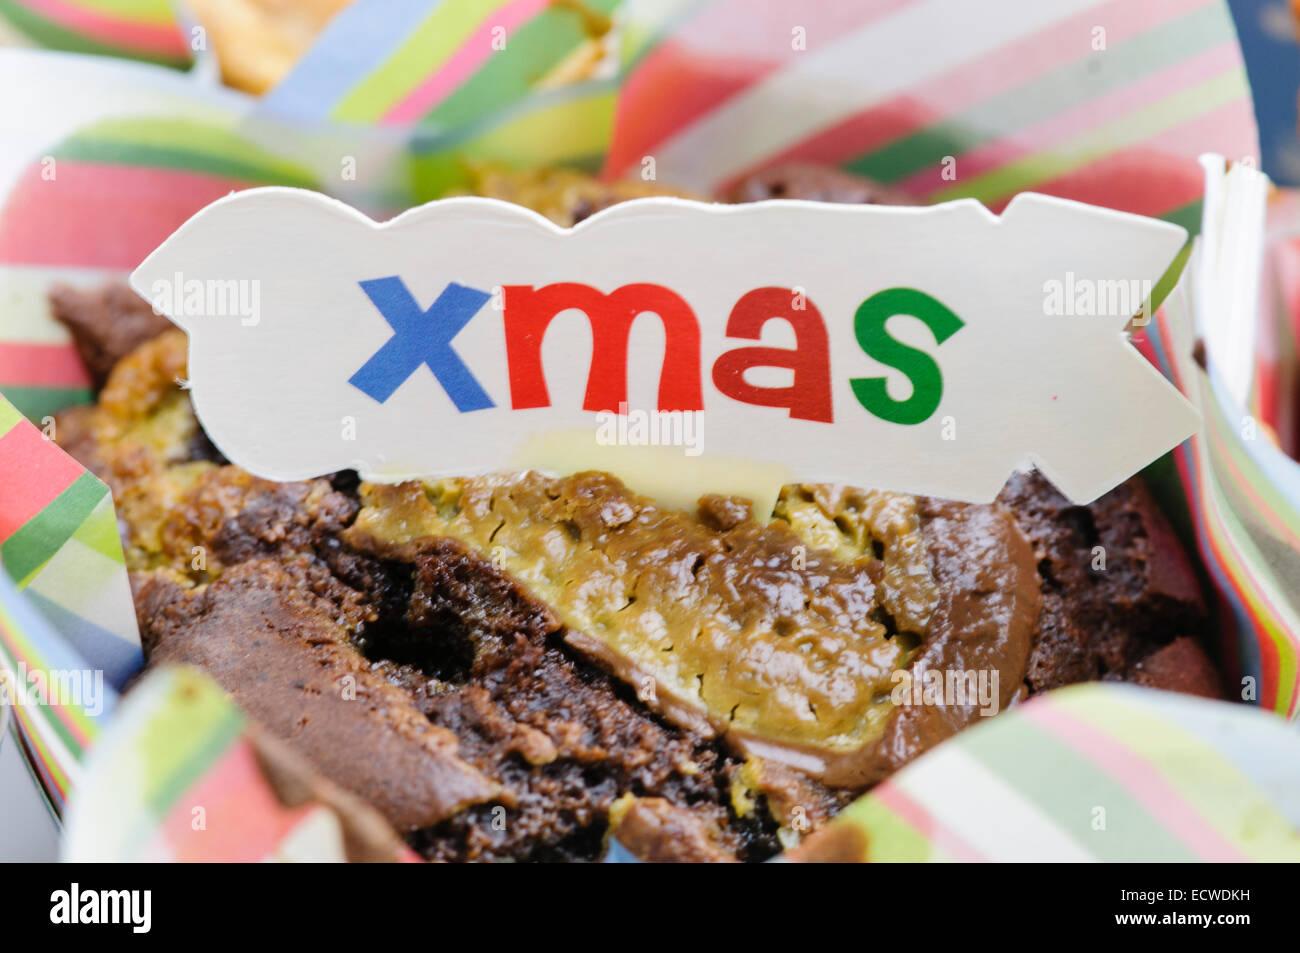 Homemade Christmas muffins - Stock Image